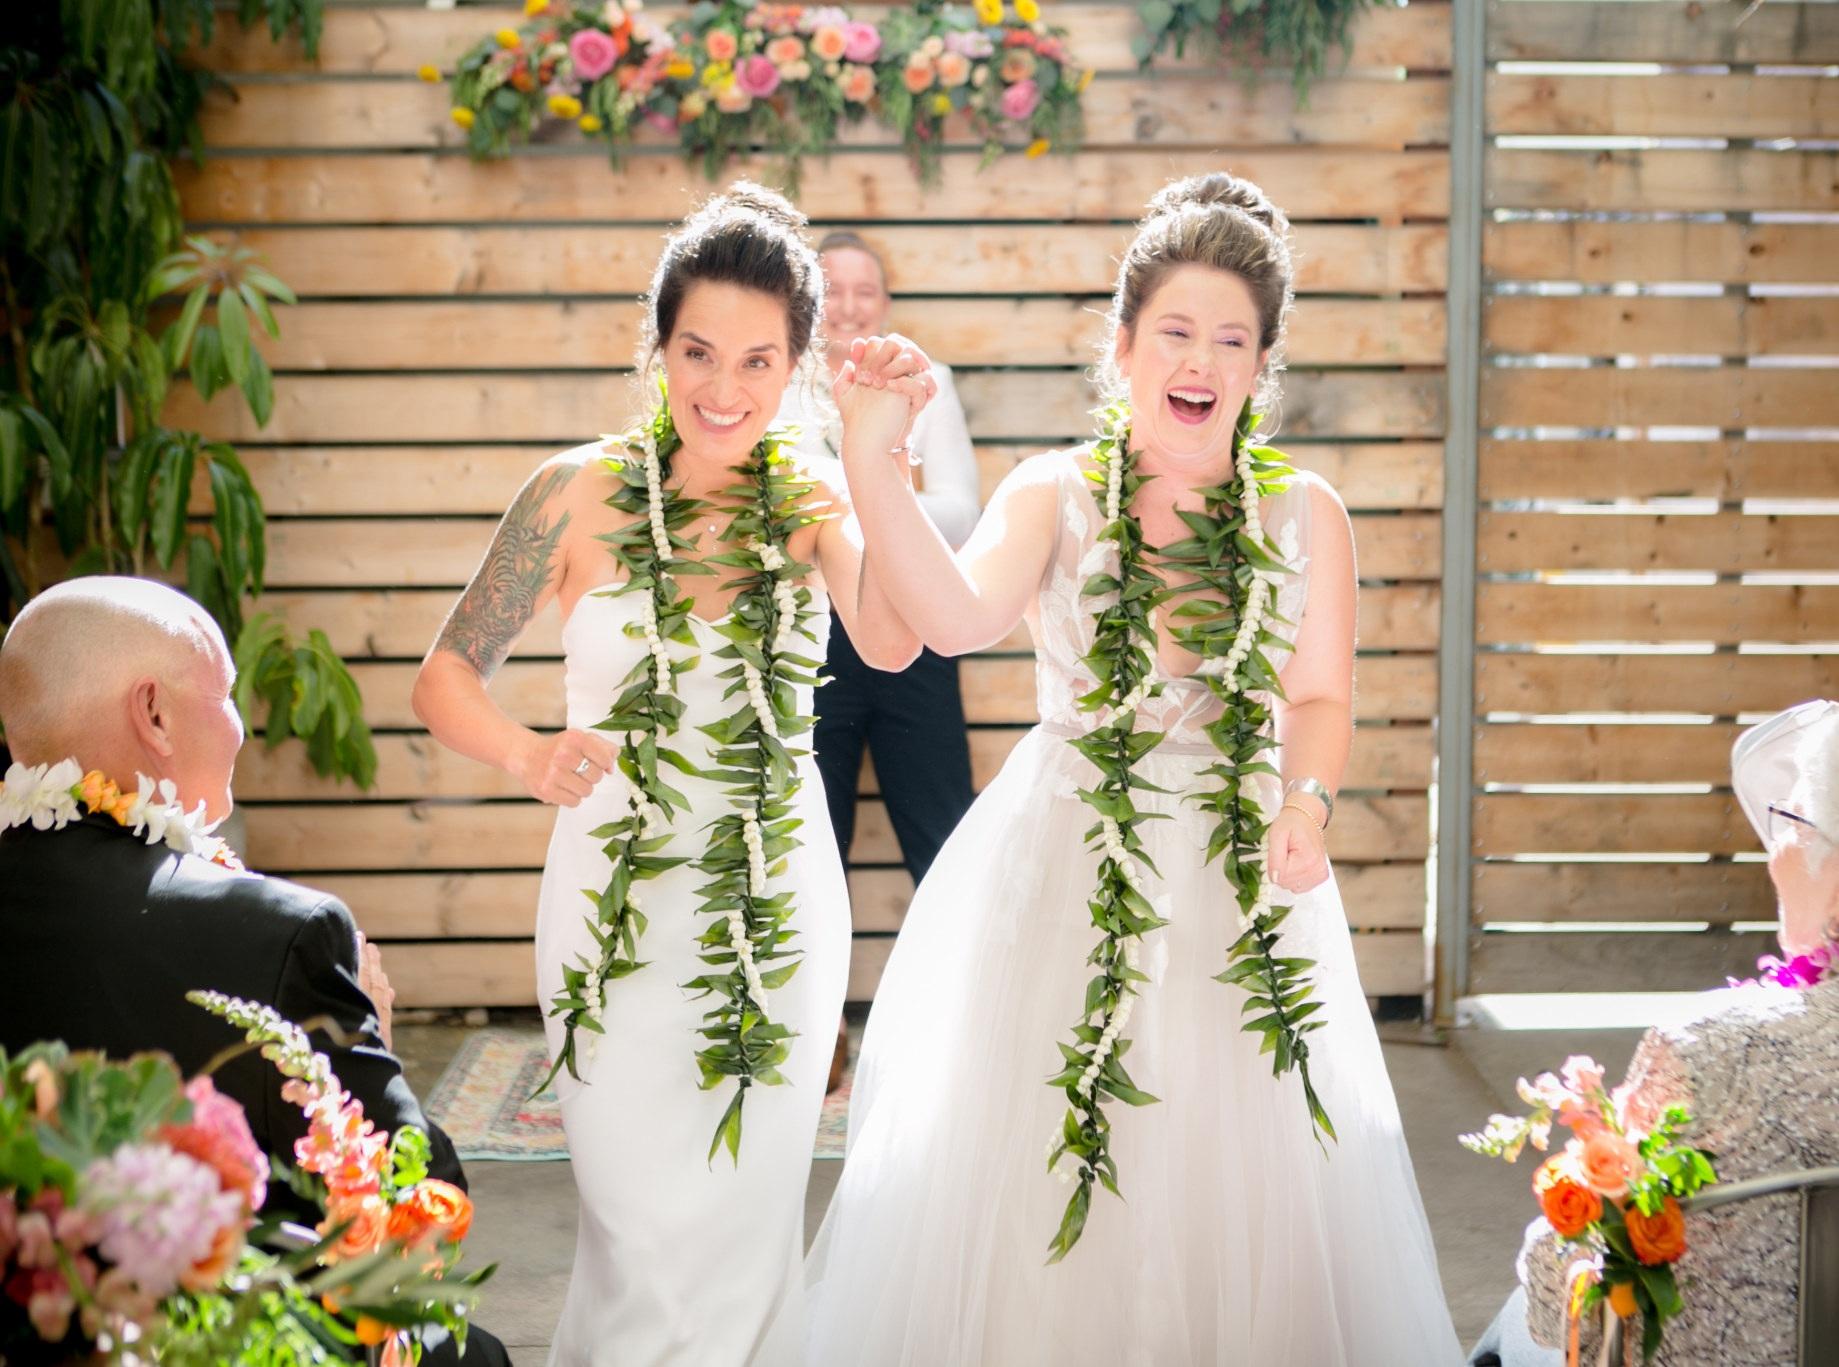 Bright_Florals_Two_Bouquets_Ceremony_Sibyl_Sophia_Des_Moines_Iowa.jpg